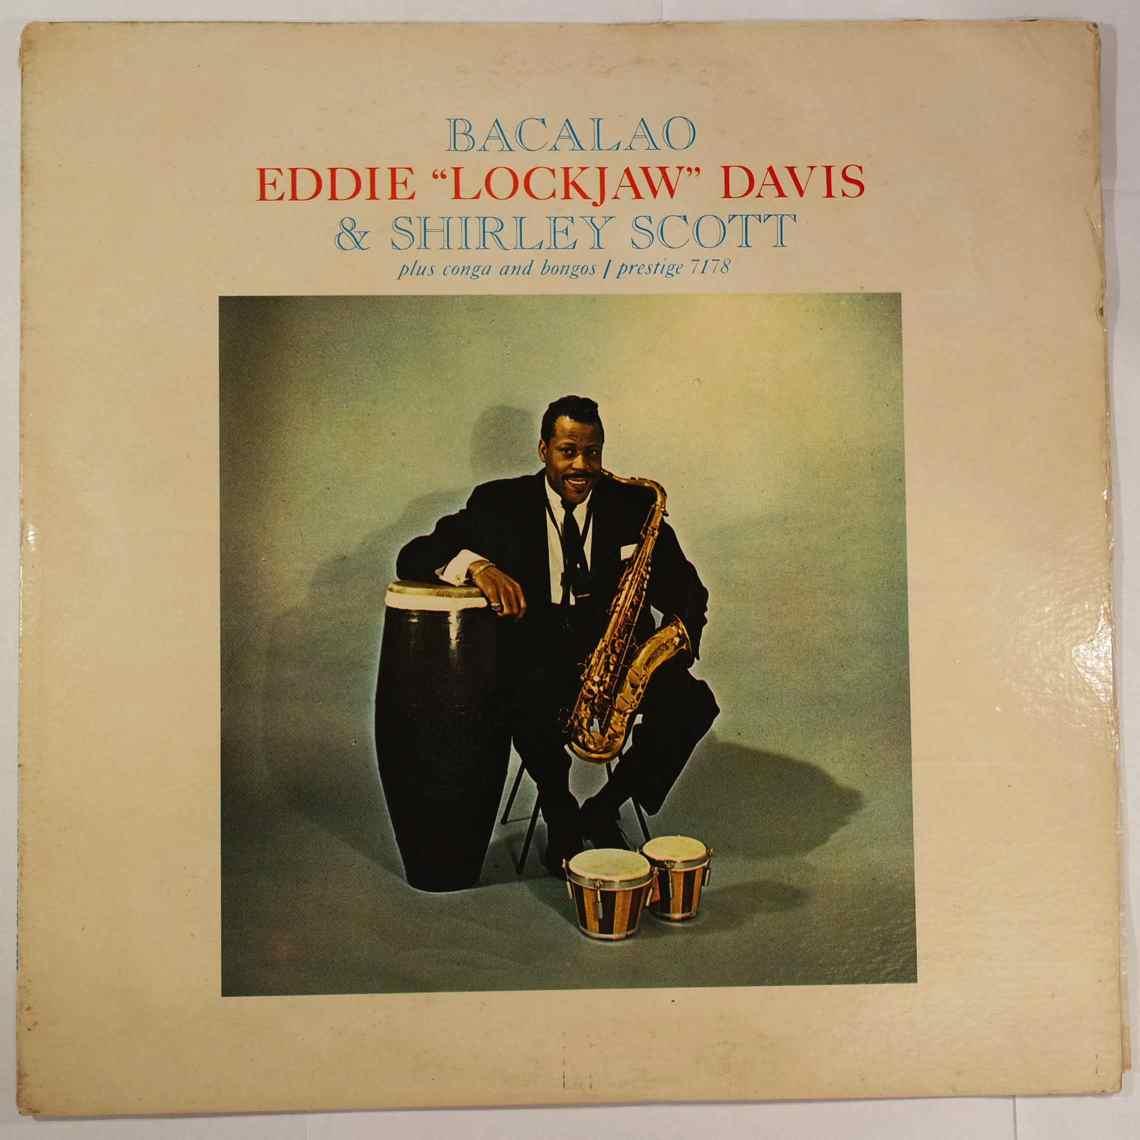 Eddie 'Lockjaw' Davis Bacalao